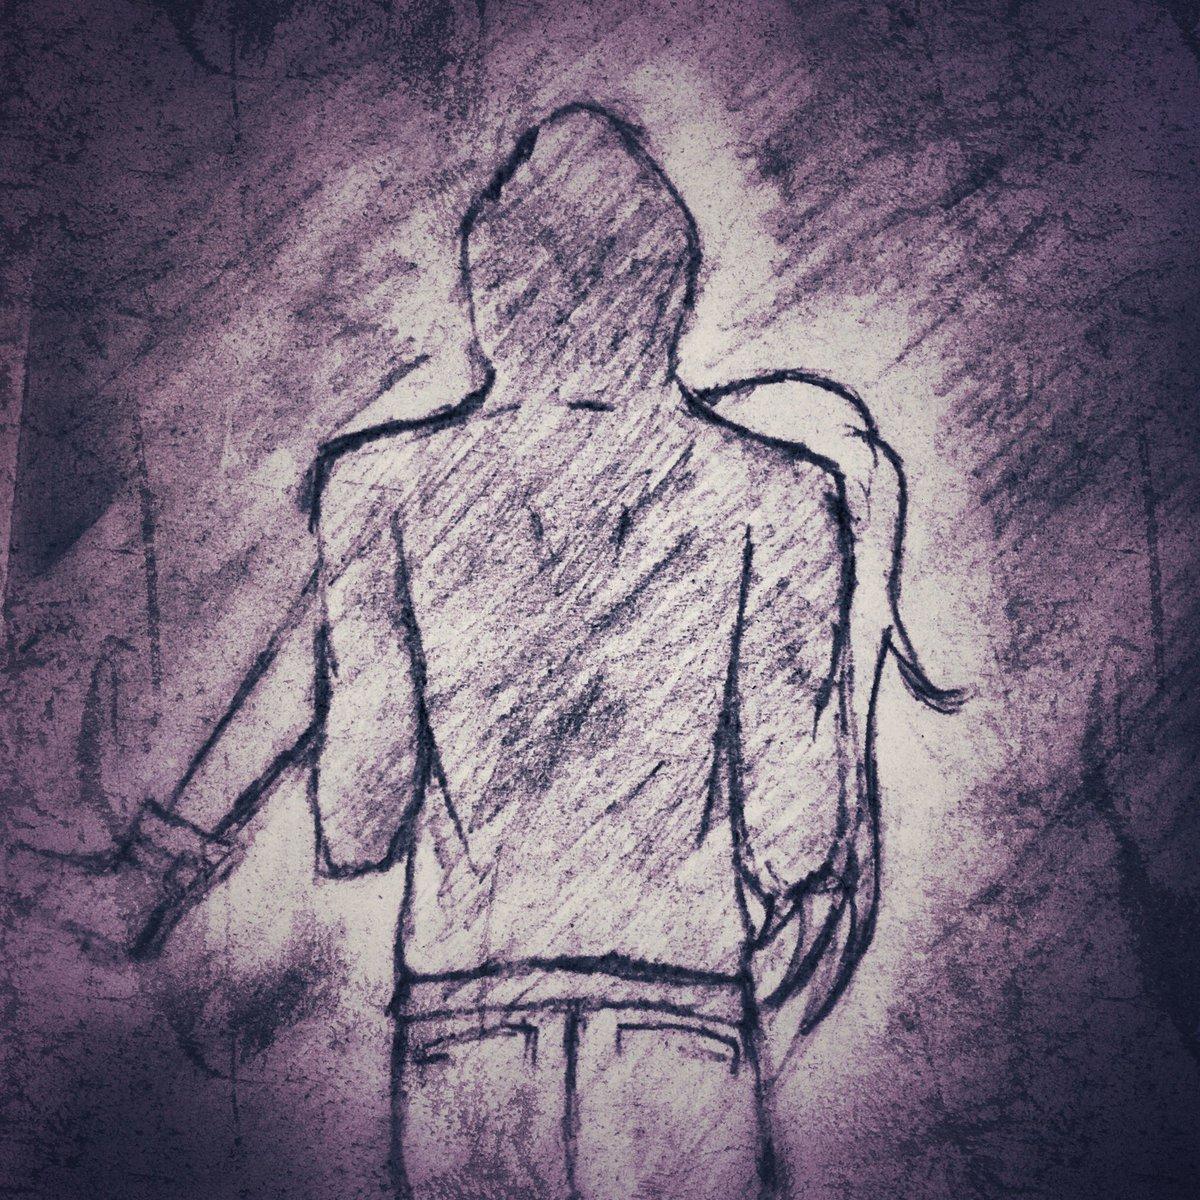 Ugh, late upload. 😖😖 #zackxray #angelsofdeath #satsurikunotenshi #drawing #ザックレイ #ザック #レイ #殺戮の天使